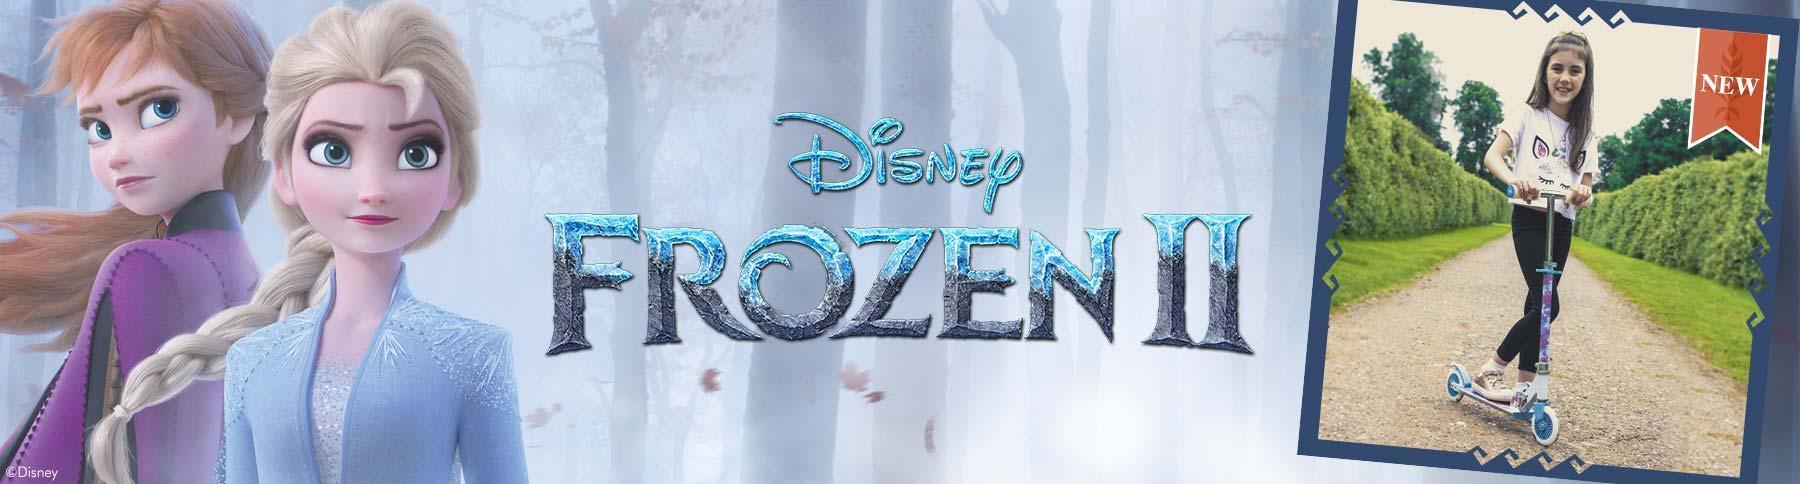 Disney's Frozen 2 Scooter range at Halfords